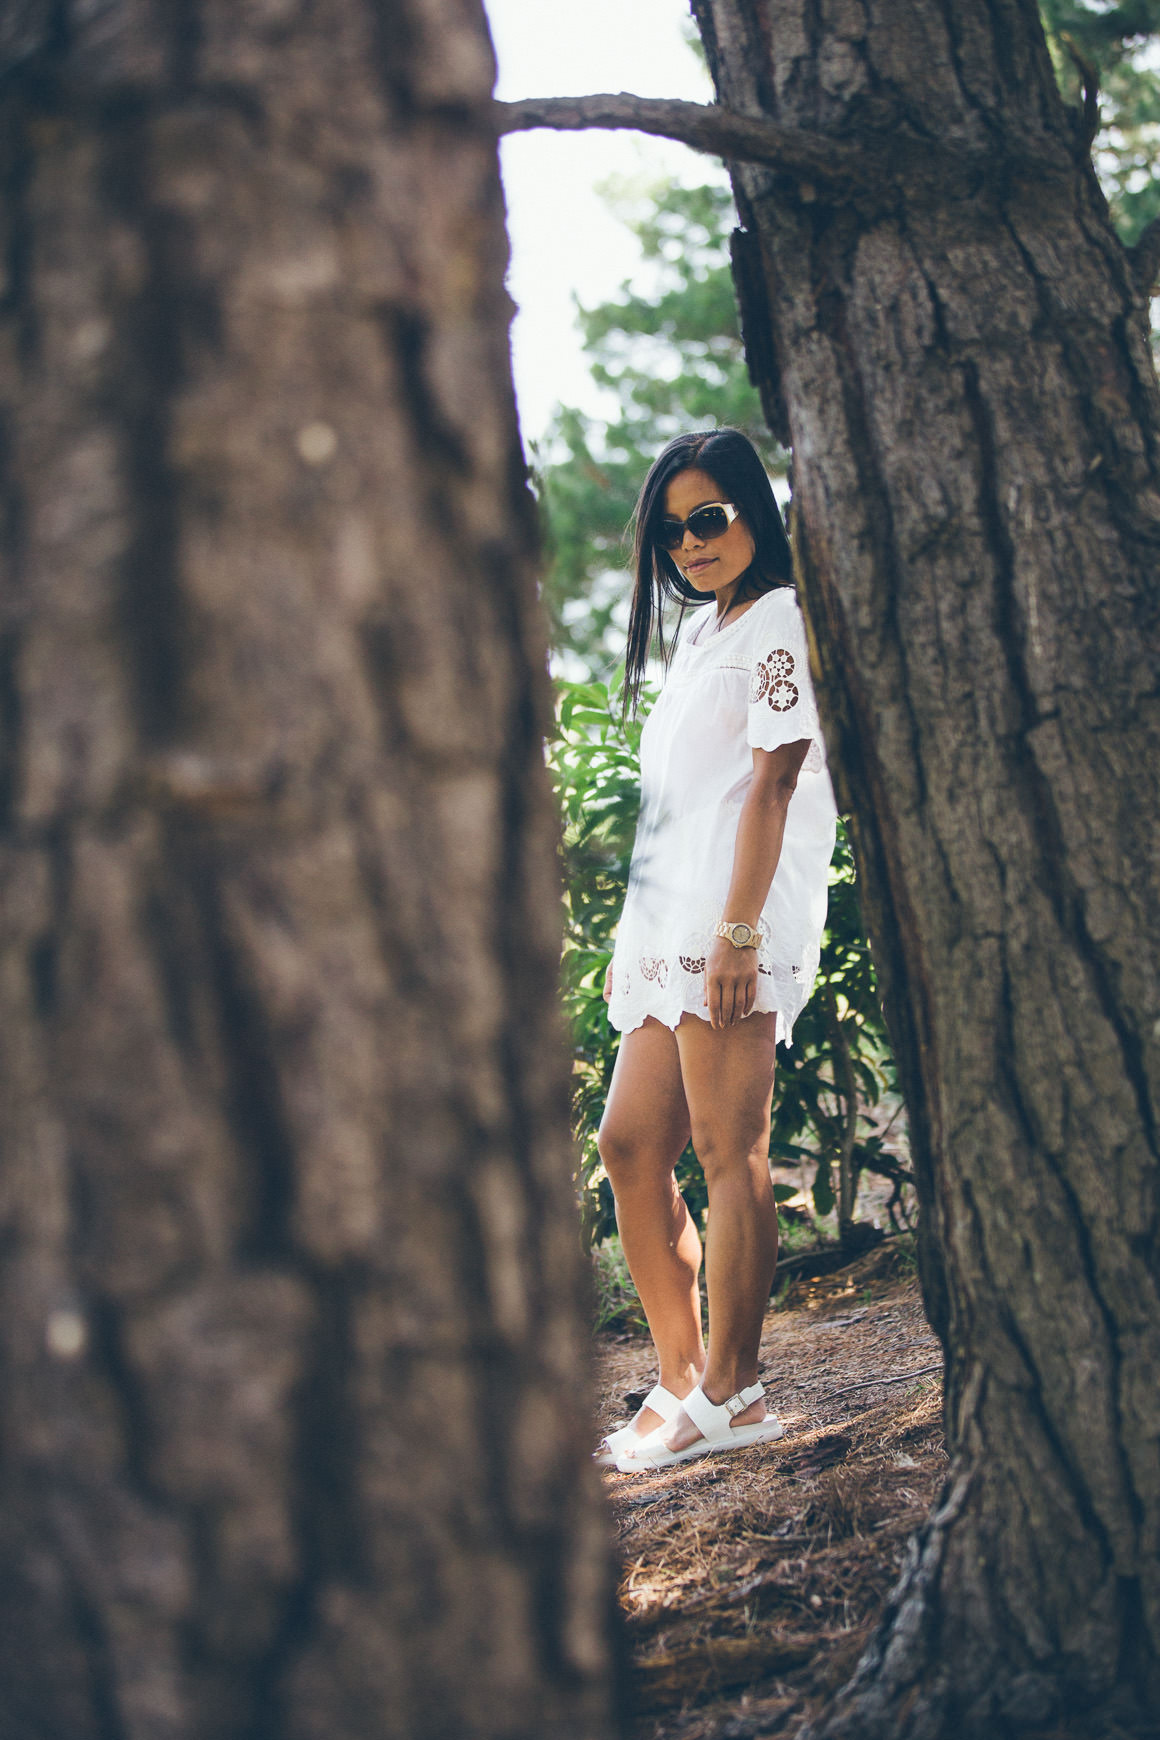 back to nature - natural fashion